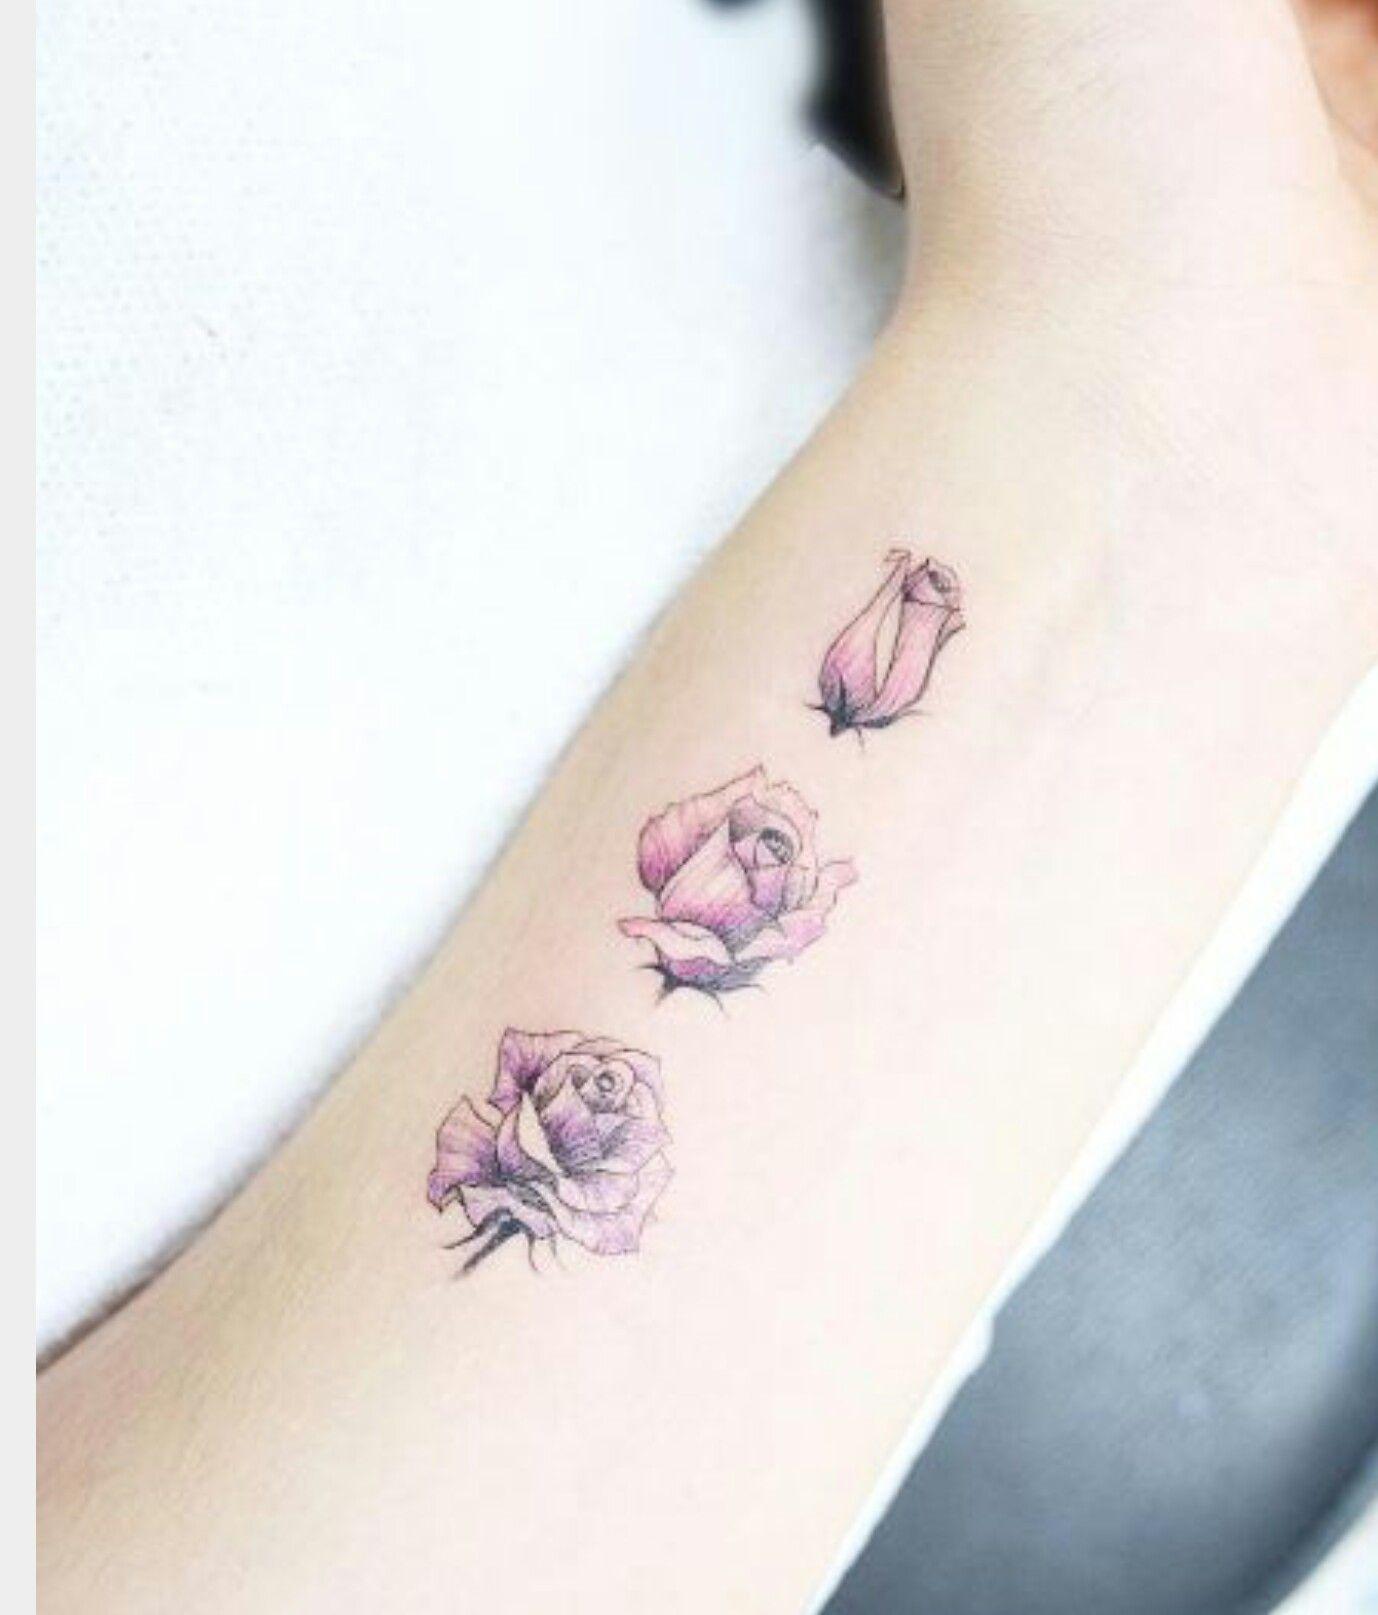 Blooming Flower Tattoo Tattoos And Piercings Pinterest